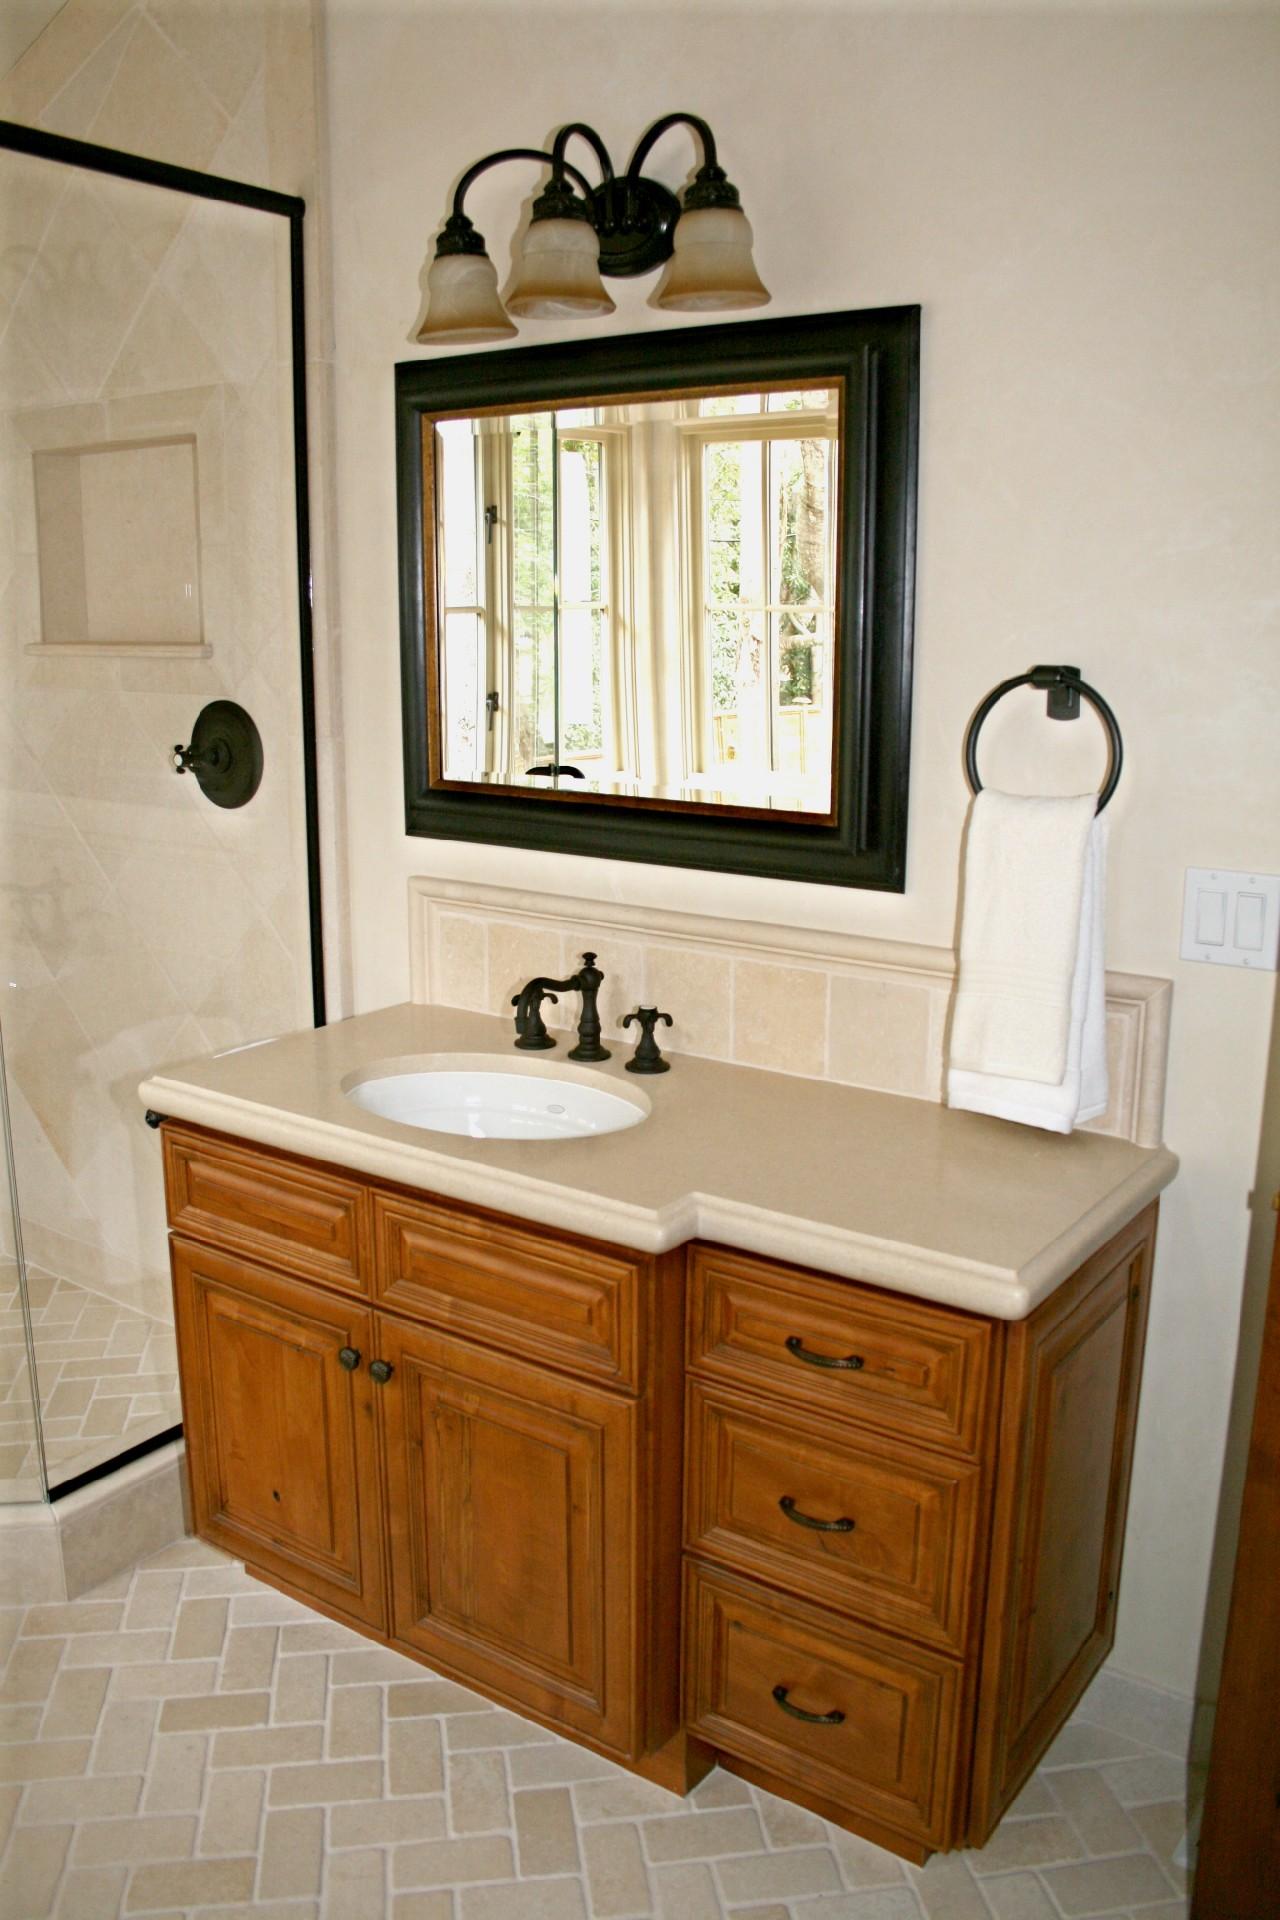 Bathroom-Carmel-Charmer-06